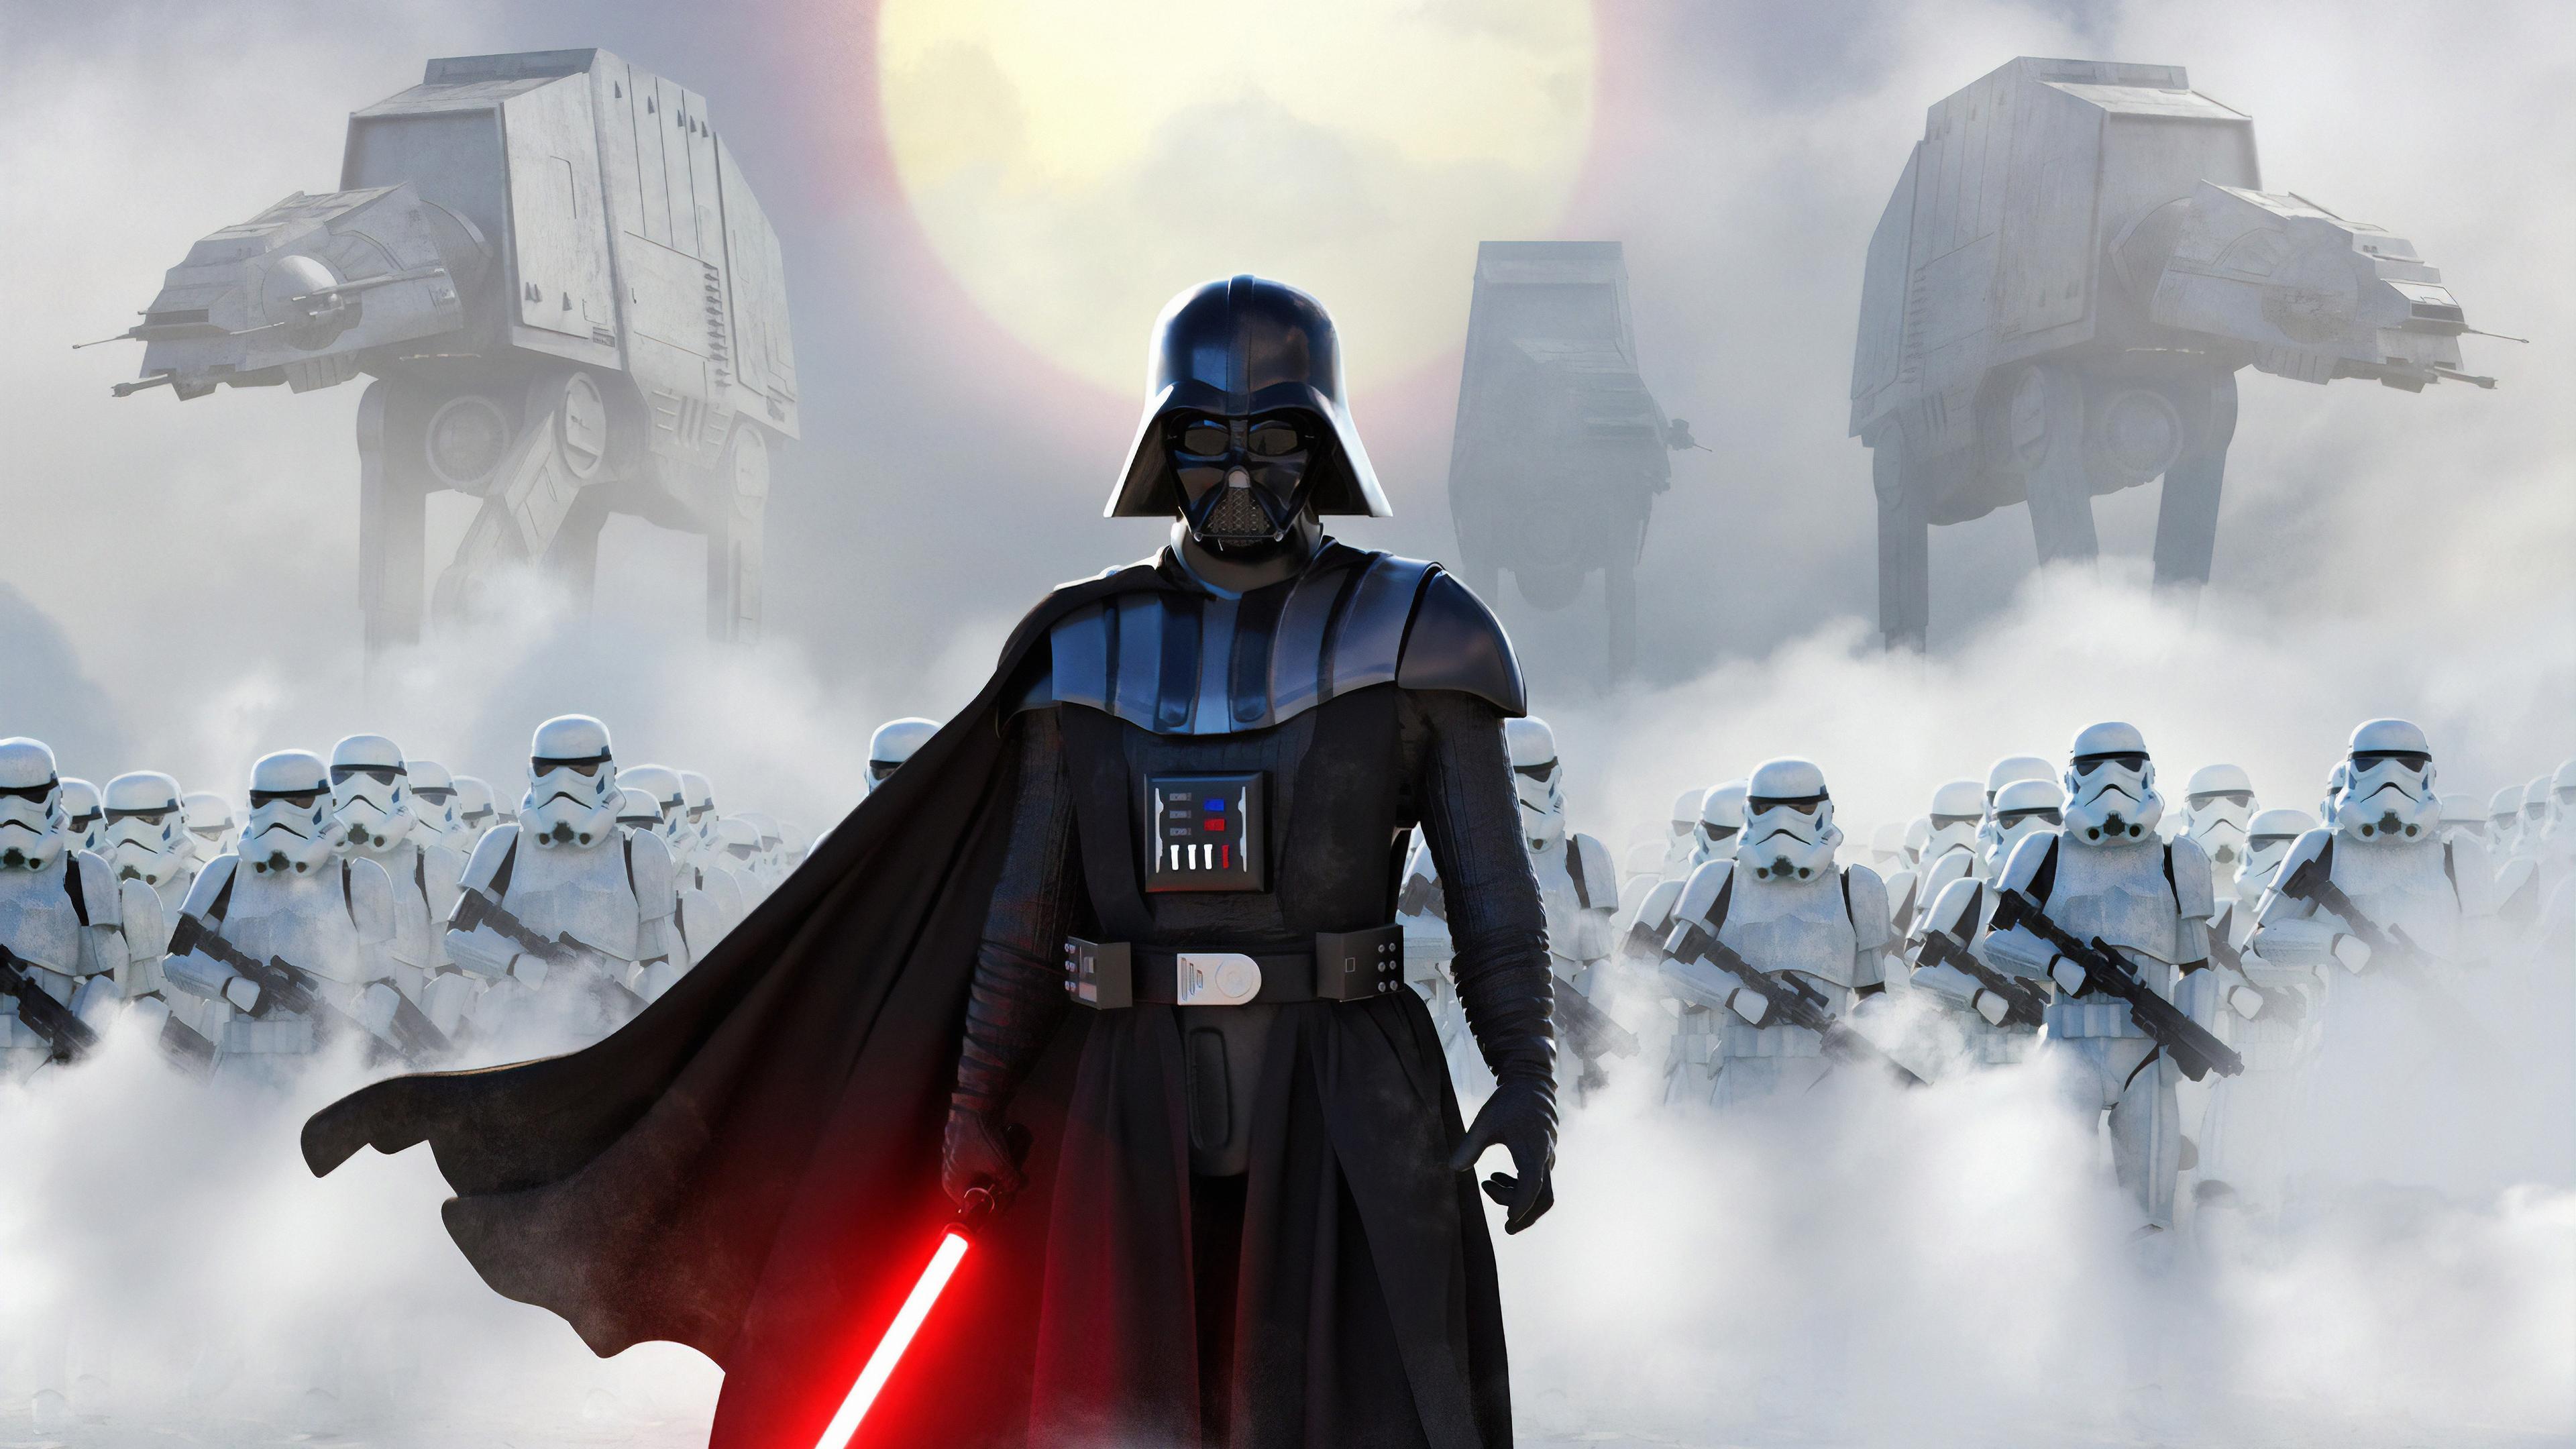 4k Darth Vader, HD Artist, 4k Wallpapers, Images ...